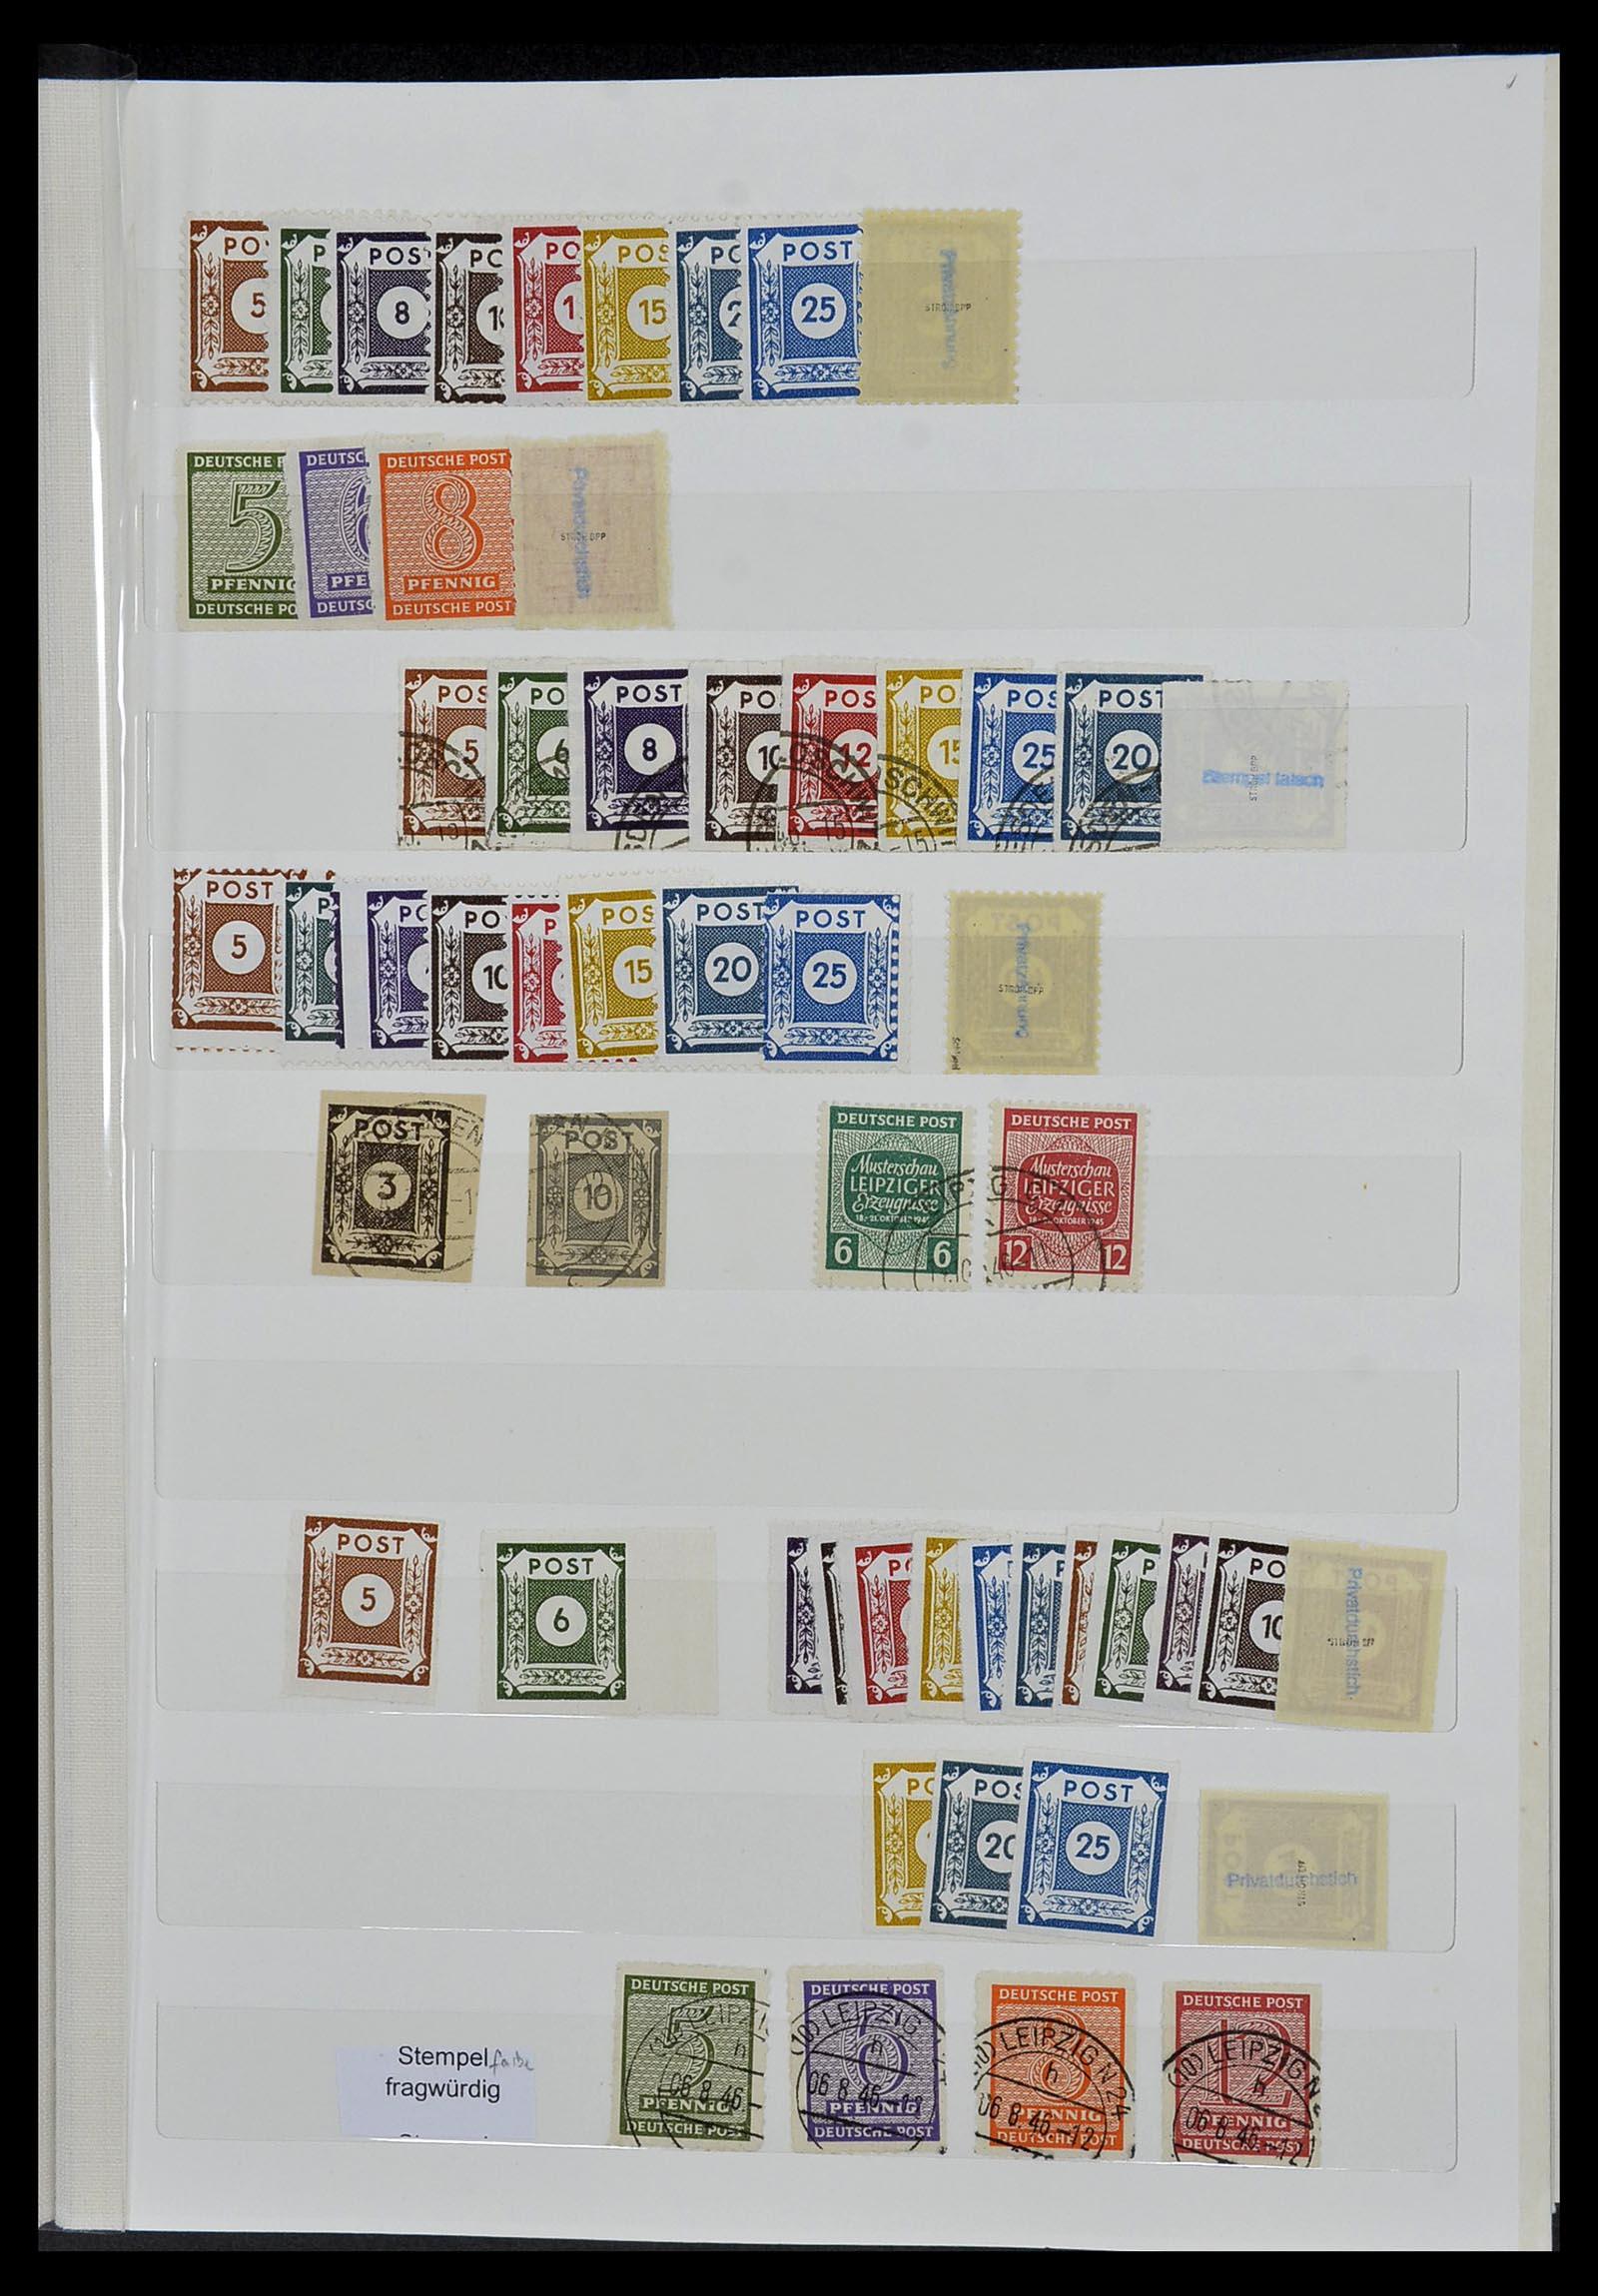 34069 012 - Postzegelverzameling 34069 Duitsland 1855-1952.